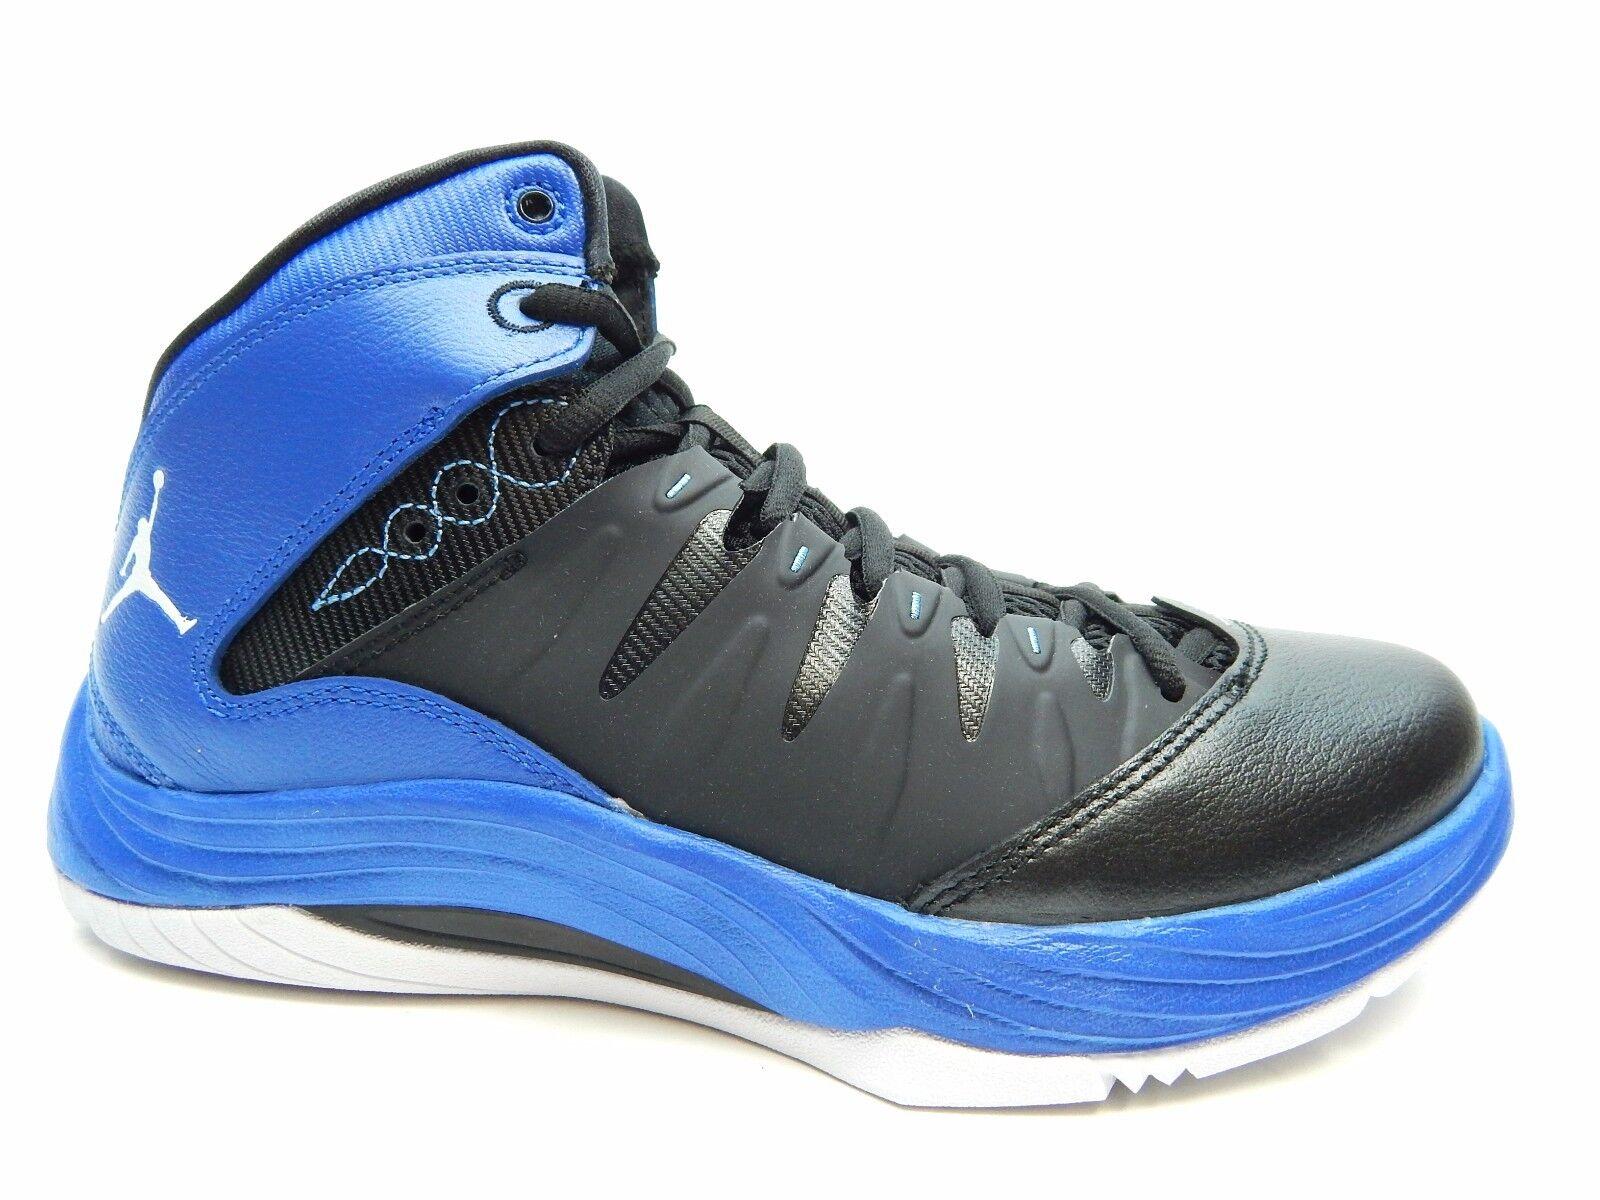 JORDAN PRIME.FLY nero bianca UNIVERSITY blu MEN scarpe Dimensione Dimensione Dimensione 7 TO 14 2acad6